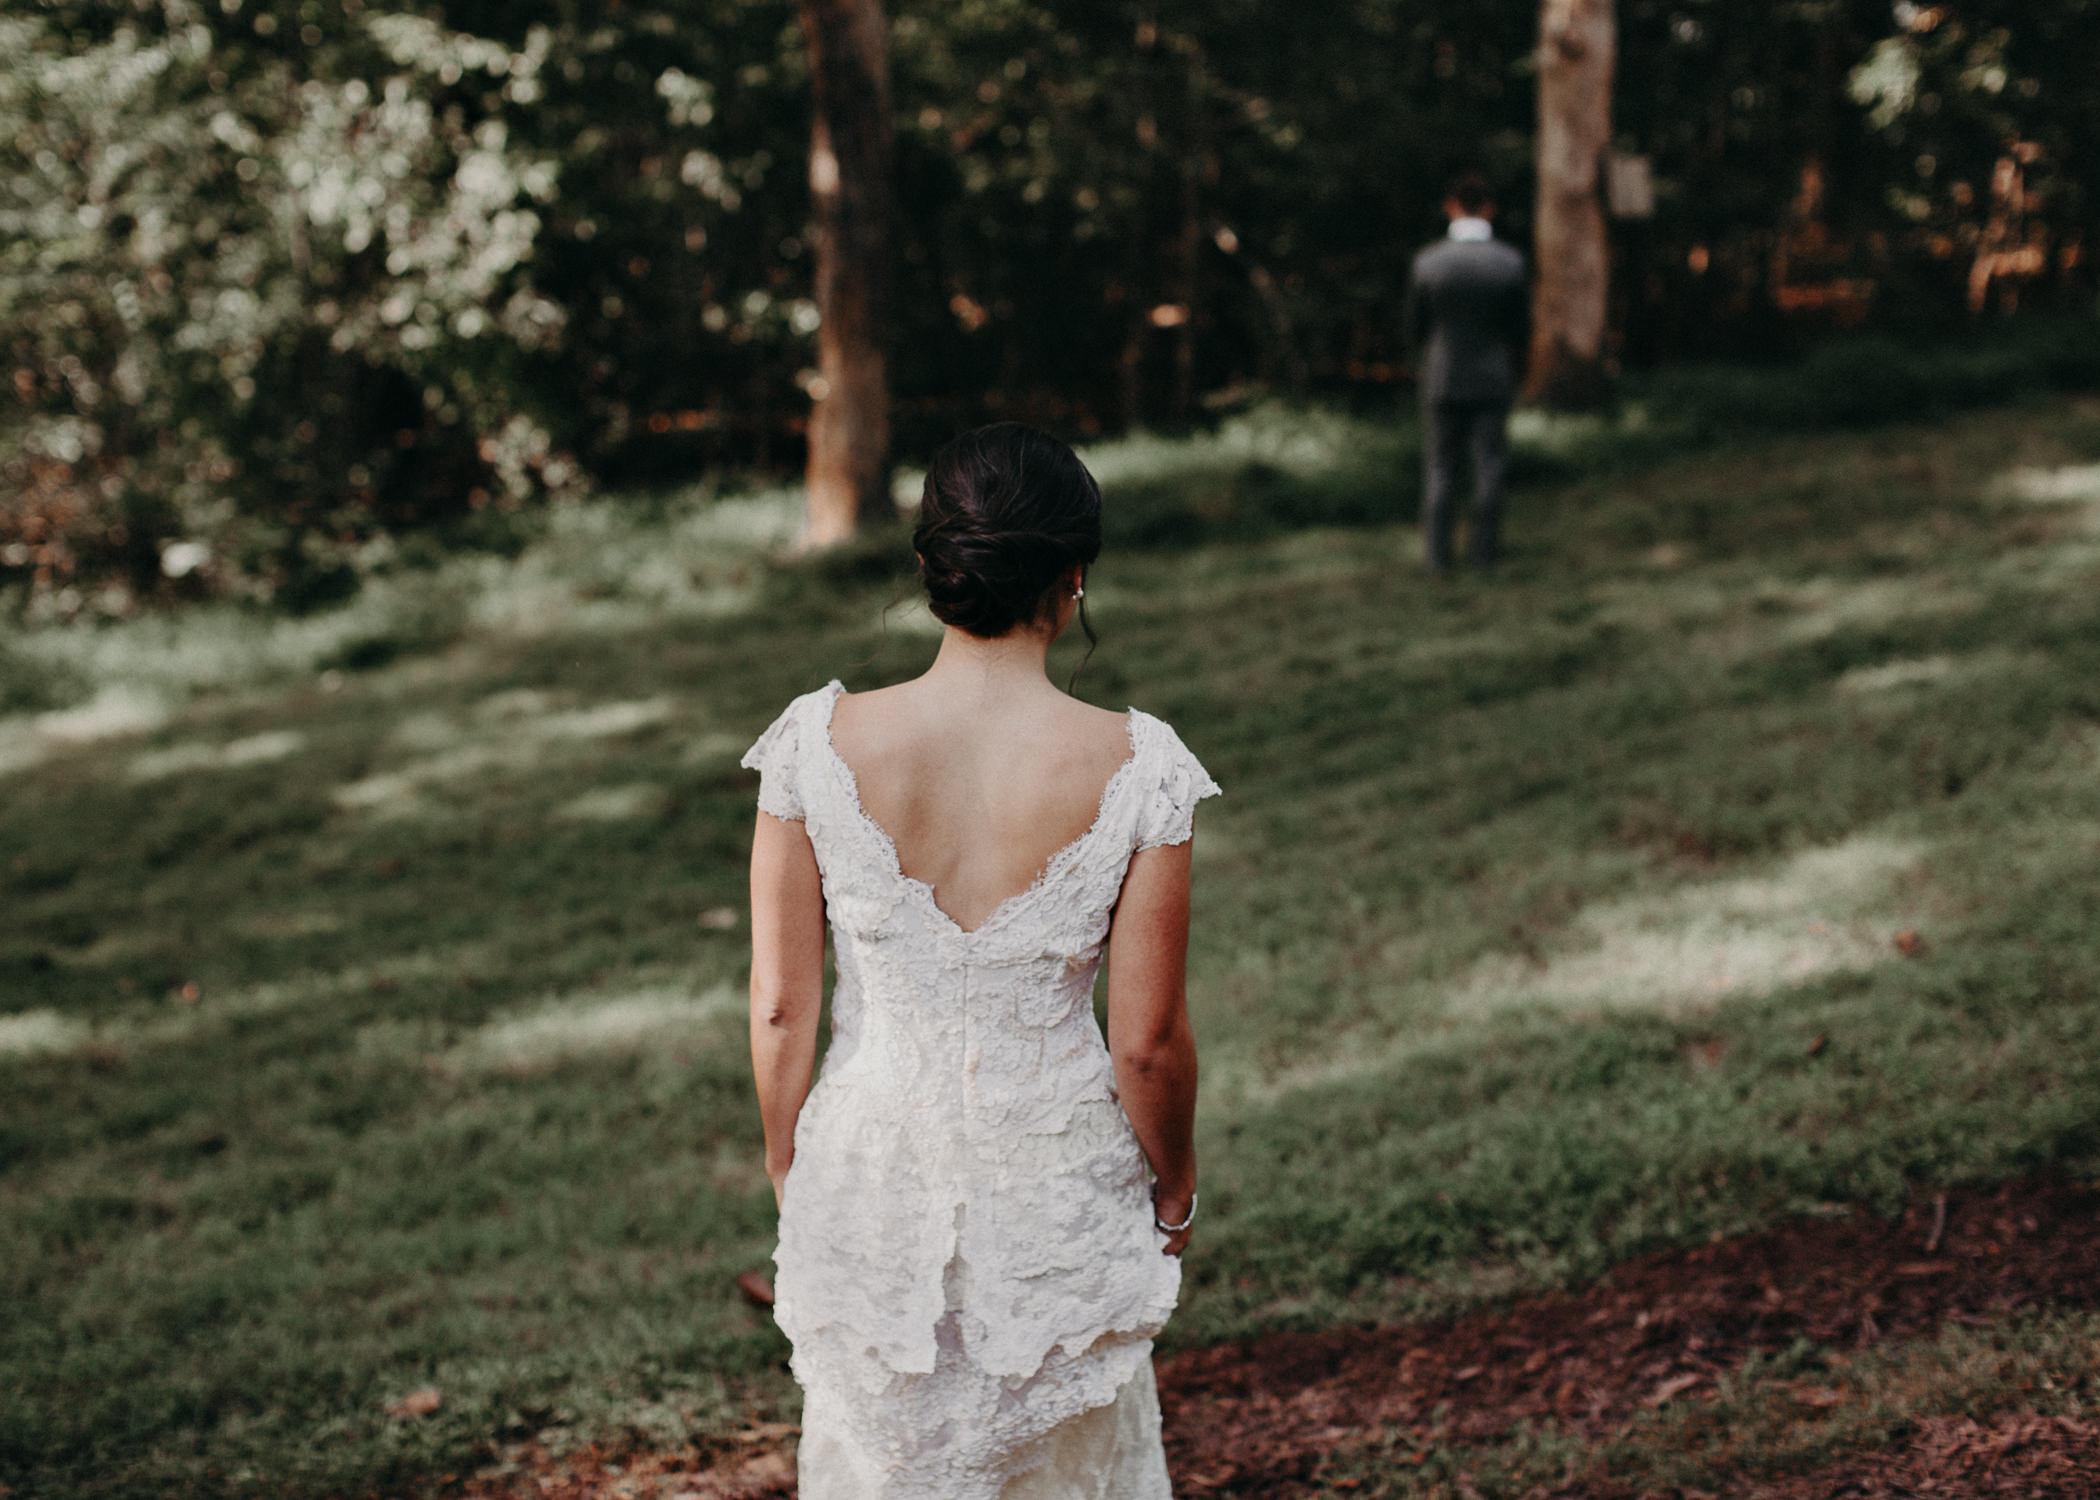 34 Bride & Groom first look before the ceremony on wedding day - Atlanta Wedding Photographer .jpg